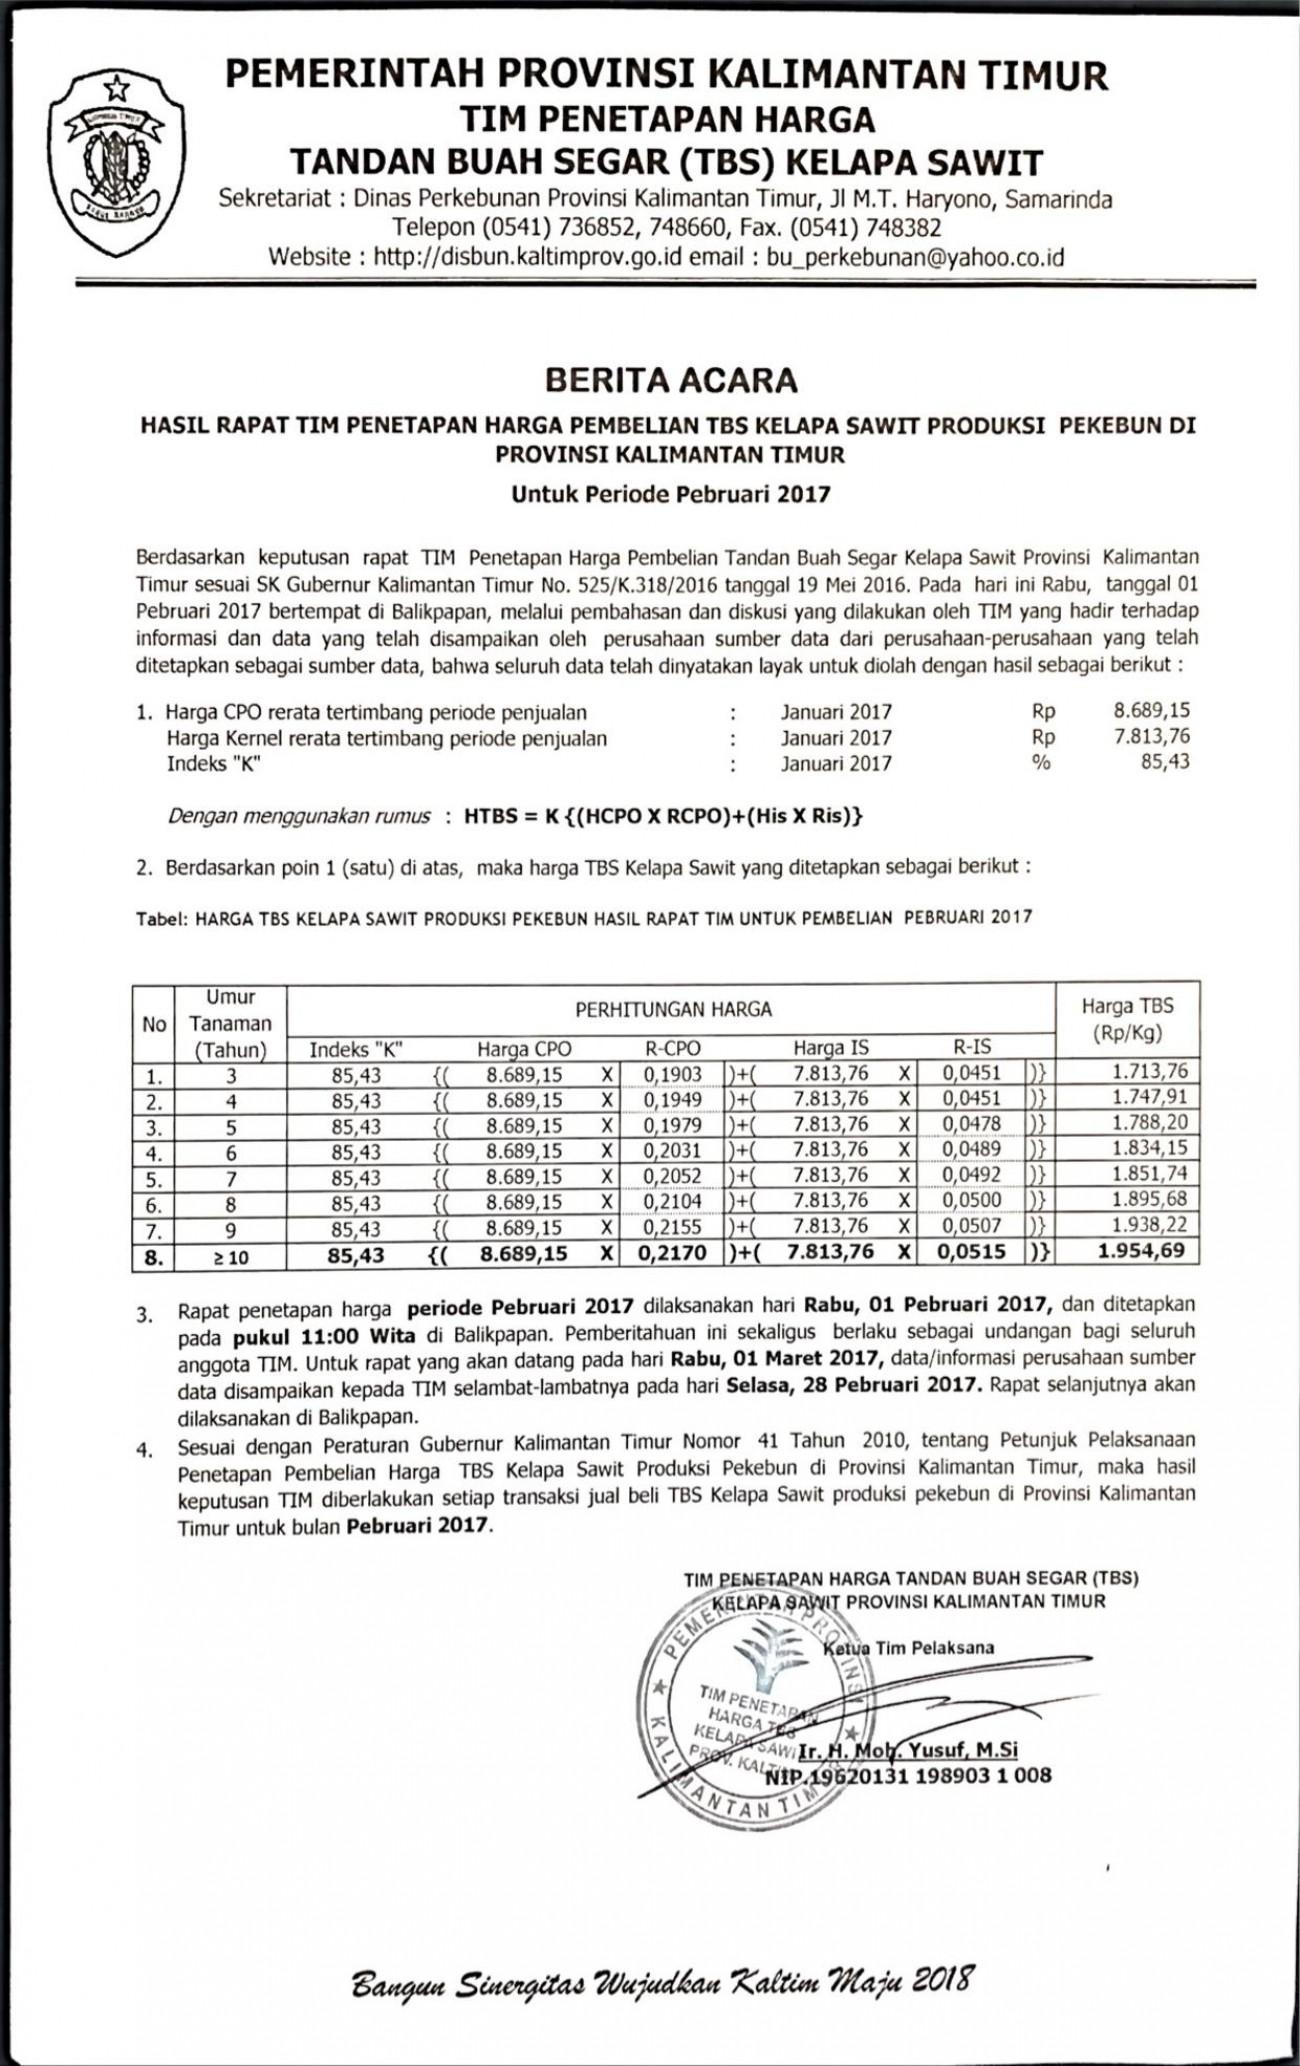 Informasi Harga TBS Kelapa Sawit Bulan Pebruari 2017